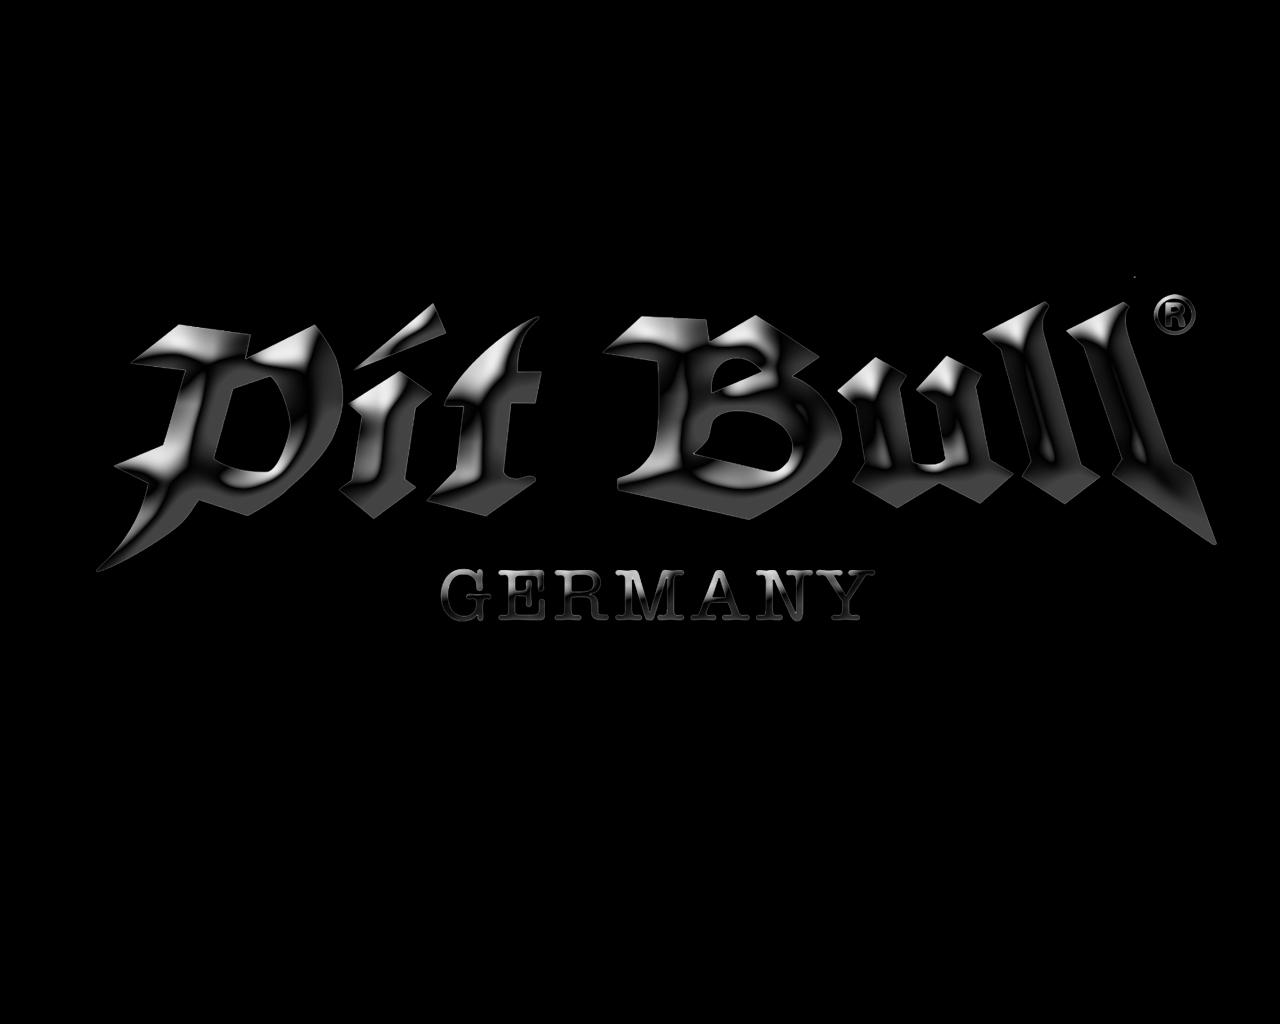 Pitbull Germany